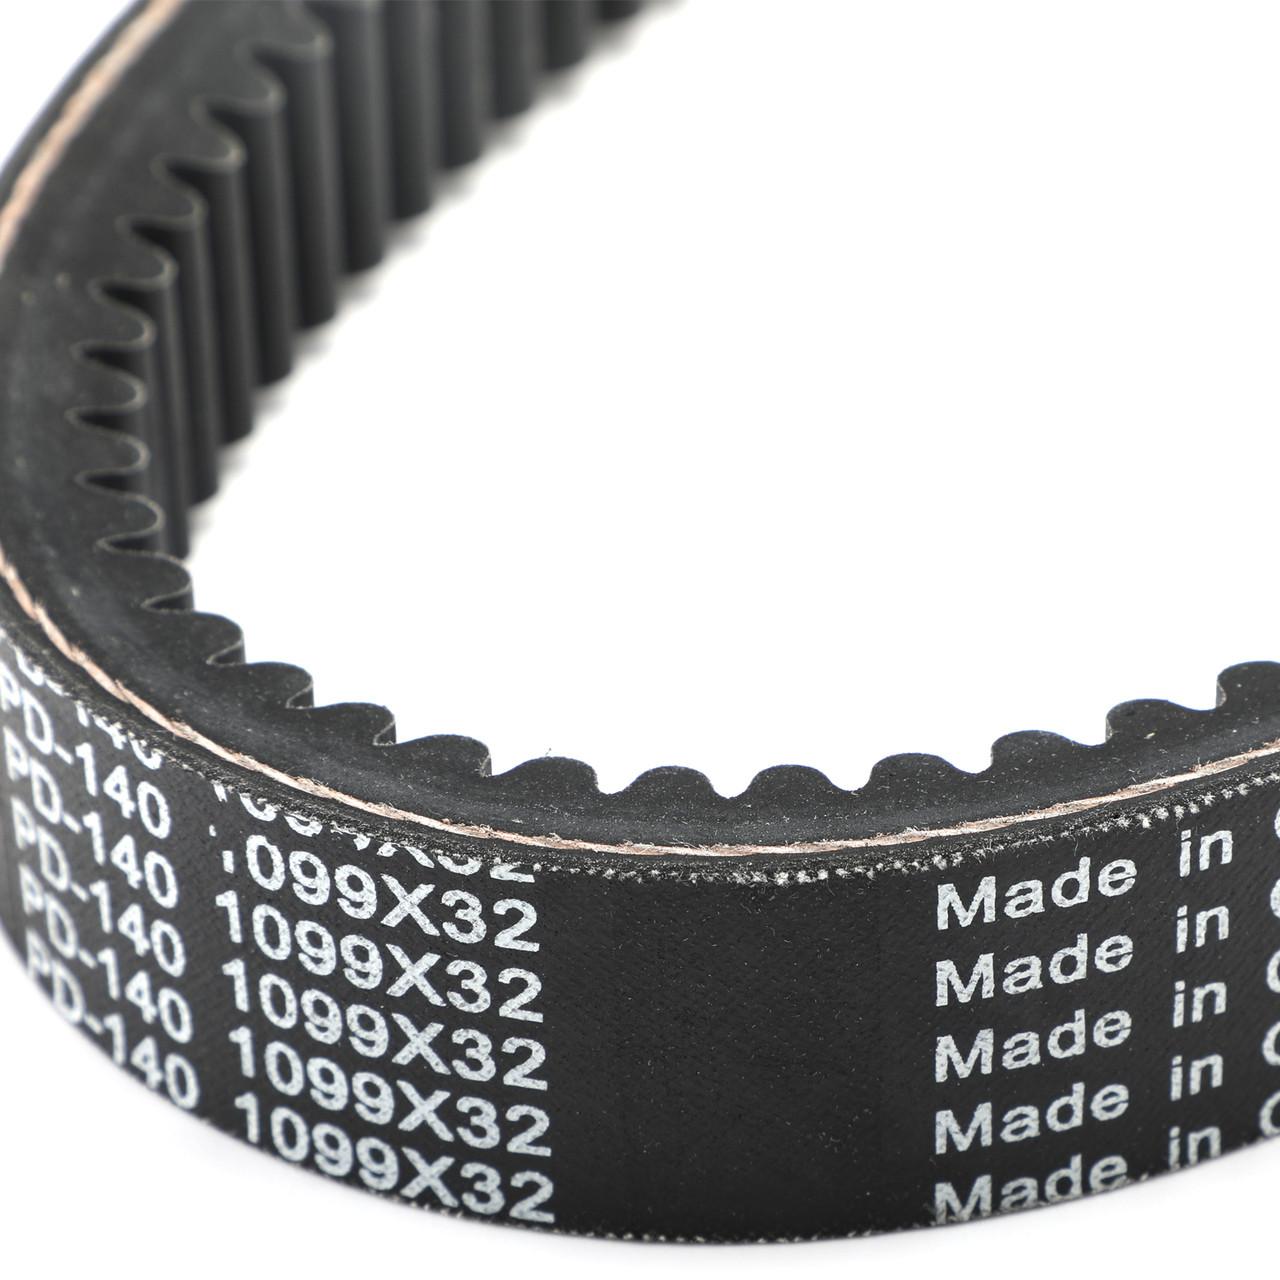 Drive belt for Yamaha ET250 EL433 ET300 Exciter  8F2-17641-00 ET340 EC540